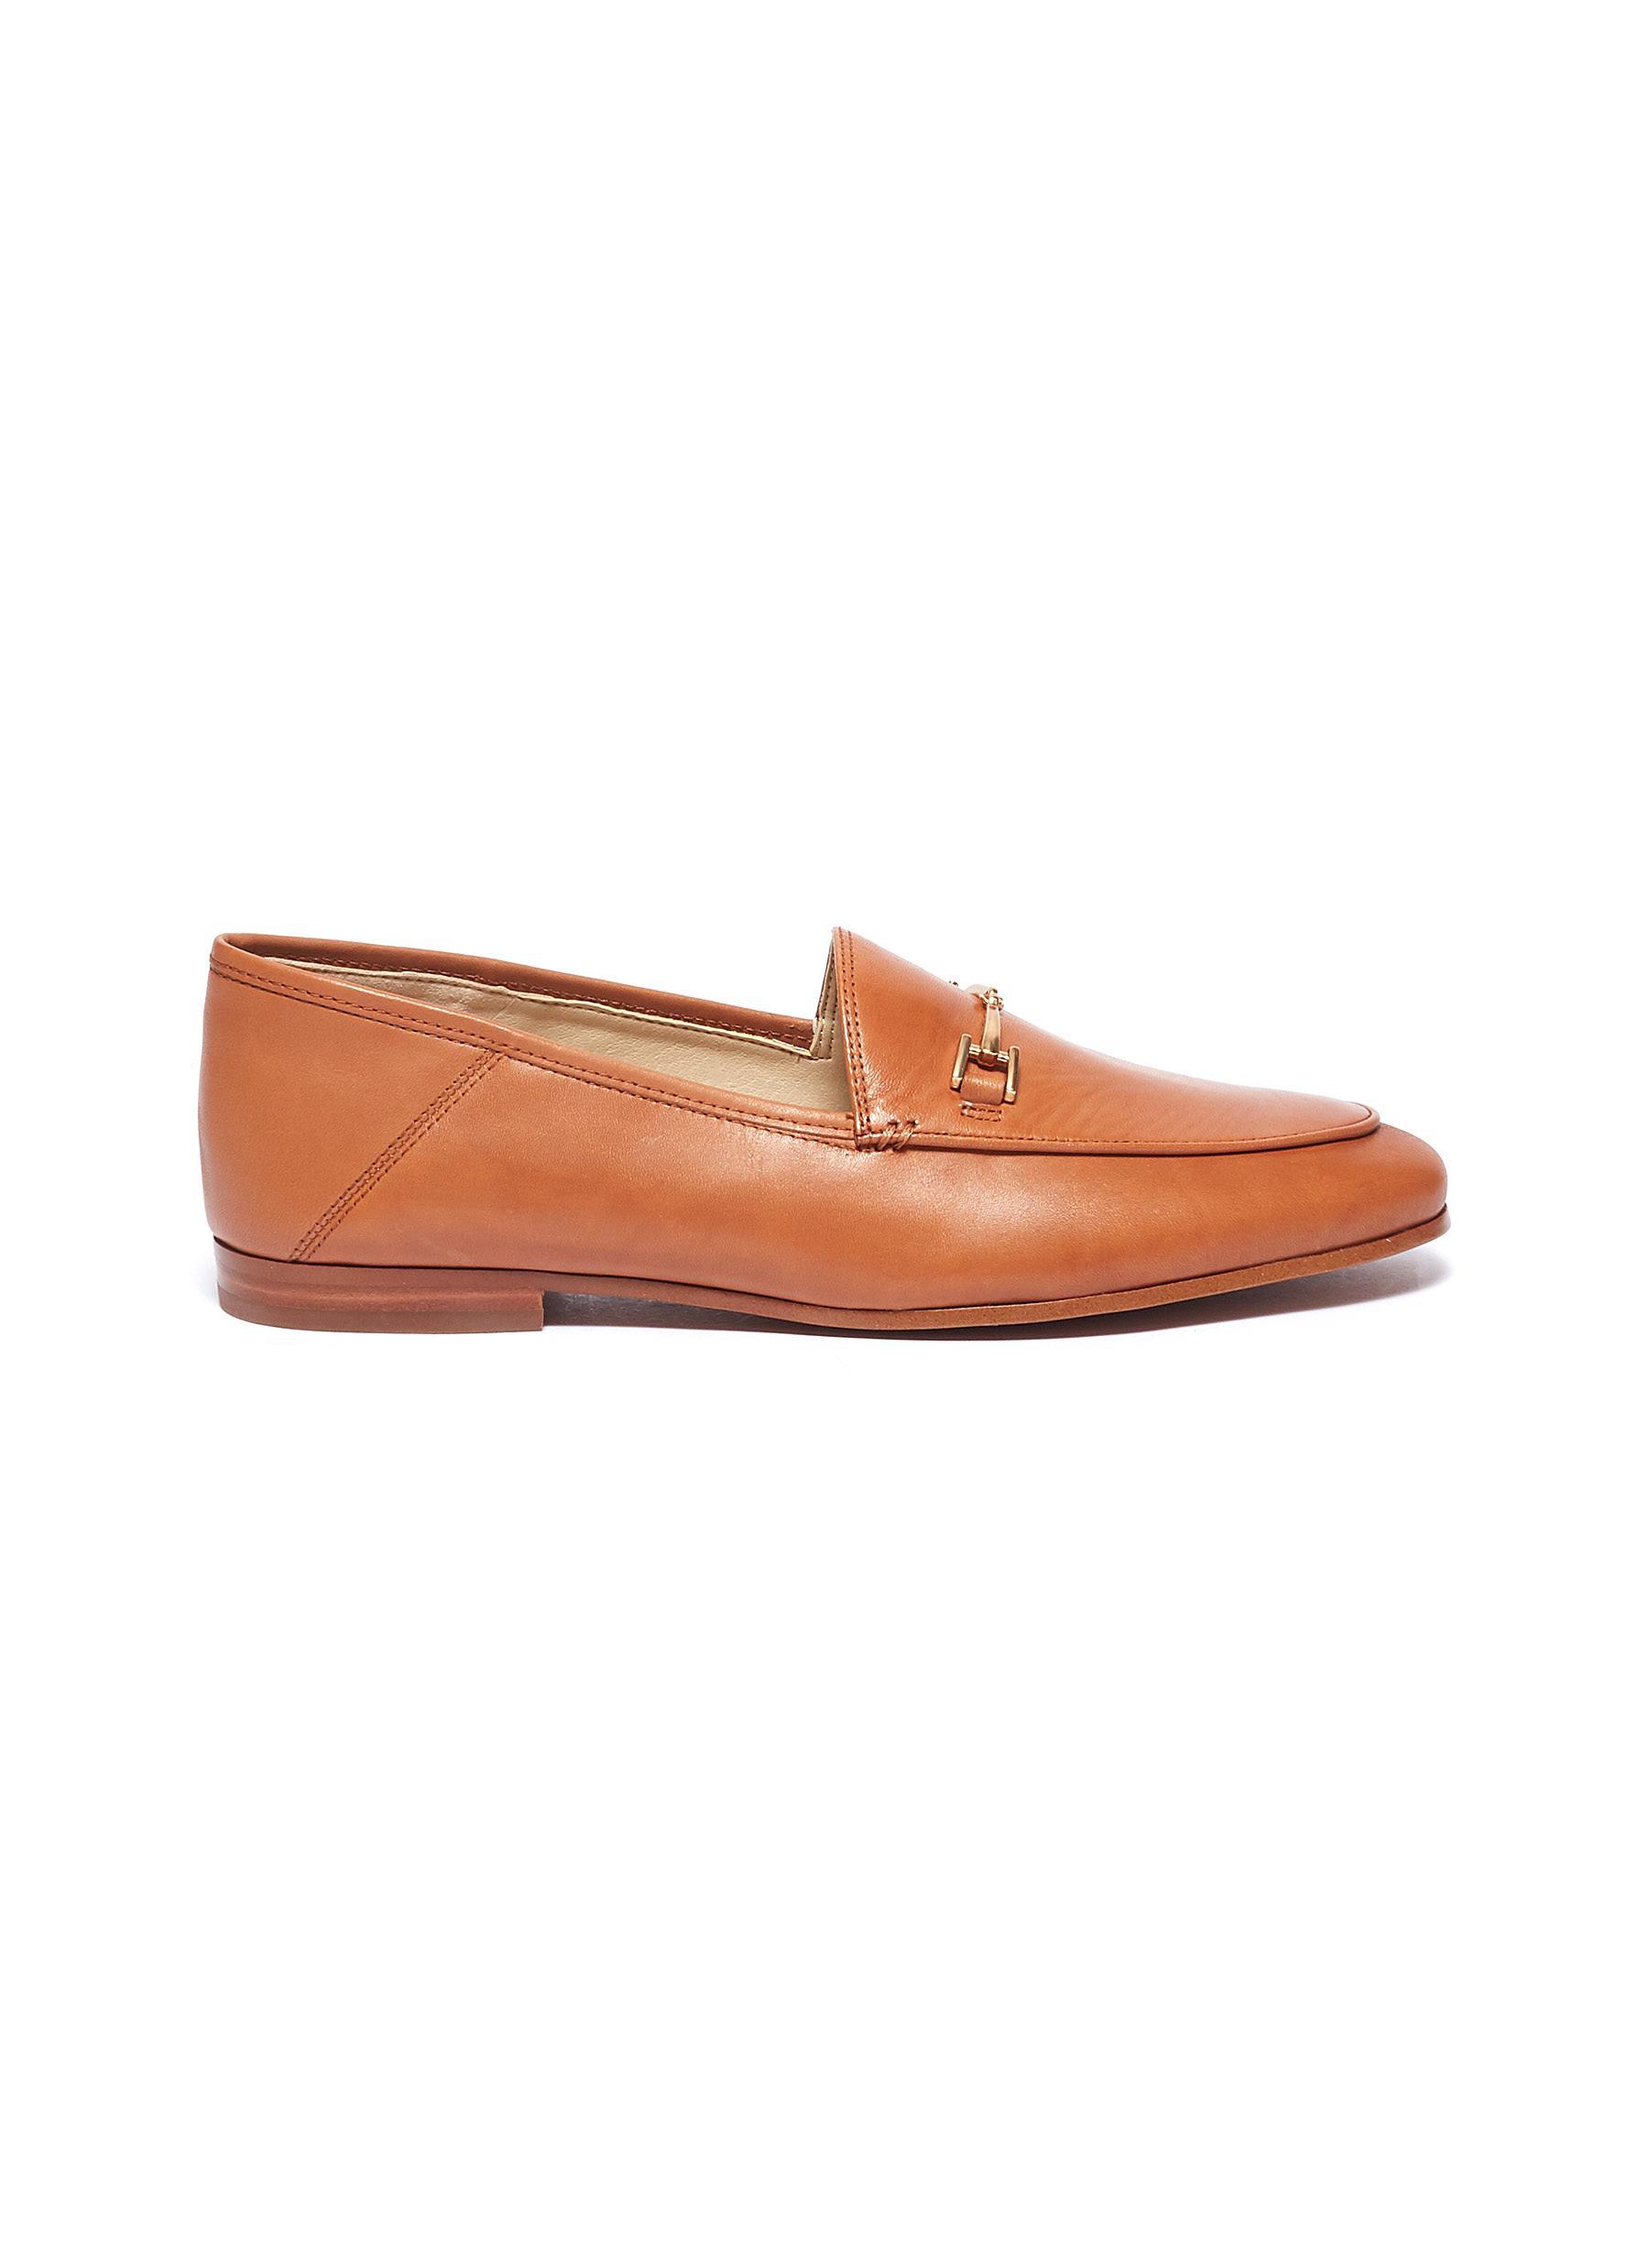 be92774b8 Sam Edelman.  Loraine  horsebit leather step-in loafers